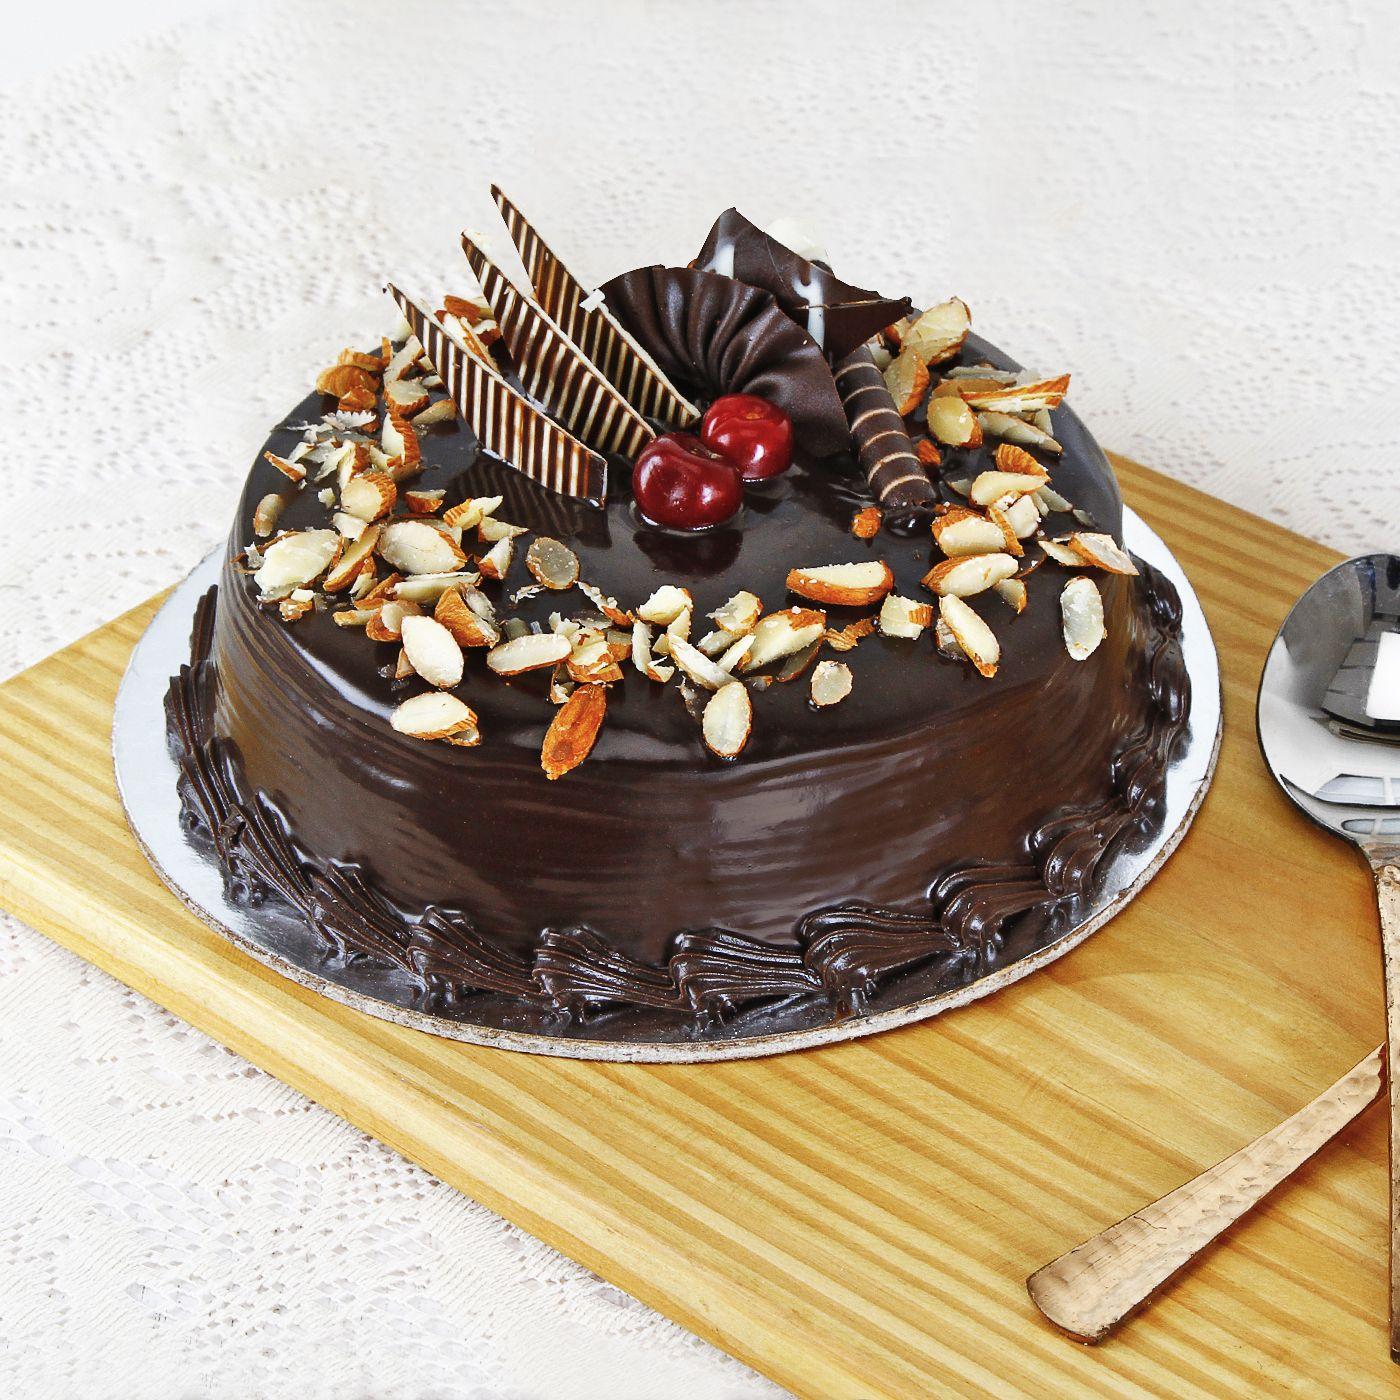 Order Chocolate Almond Cake Half Kg Online at Best Price